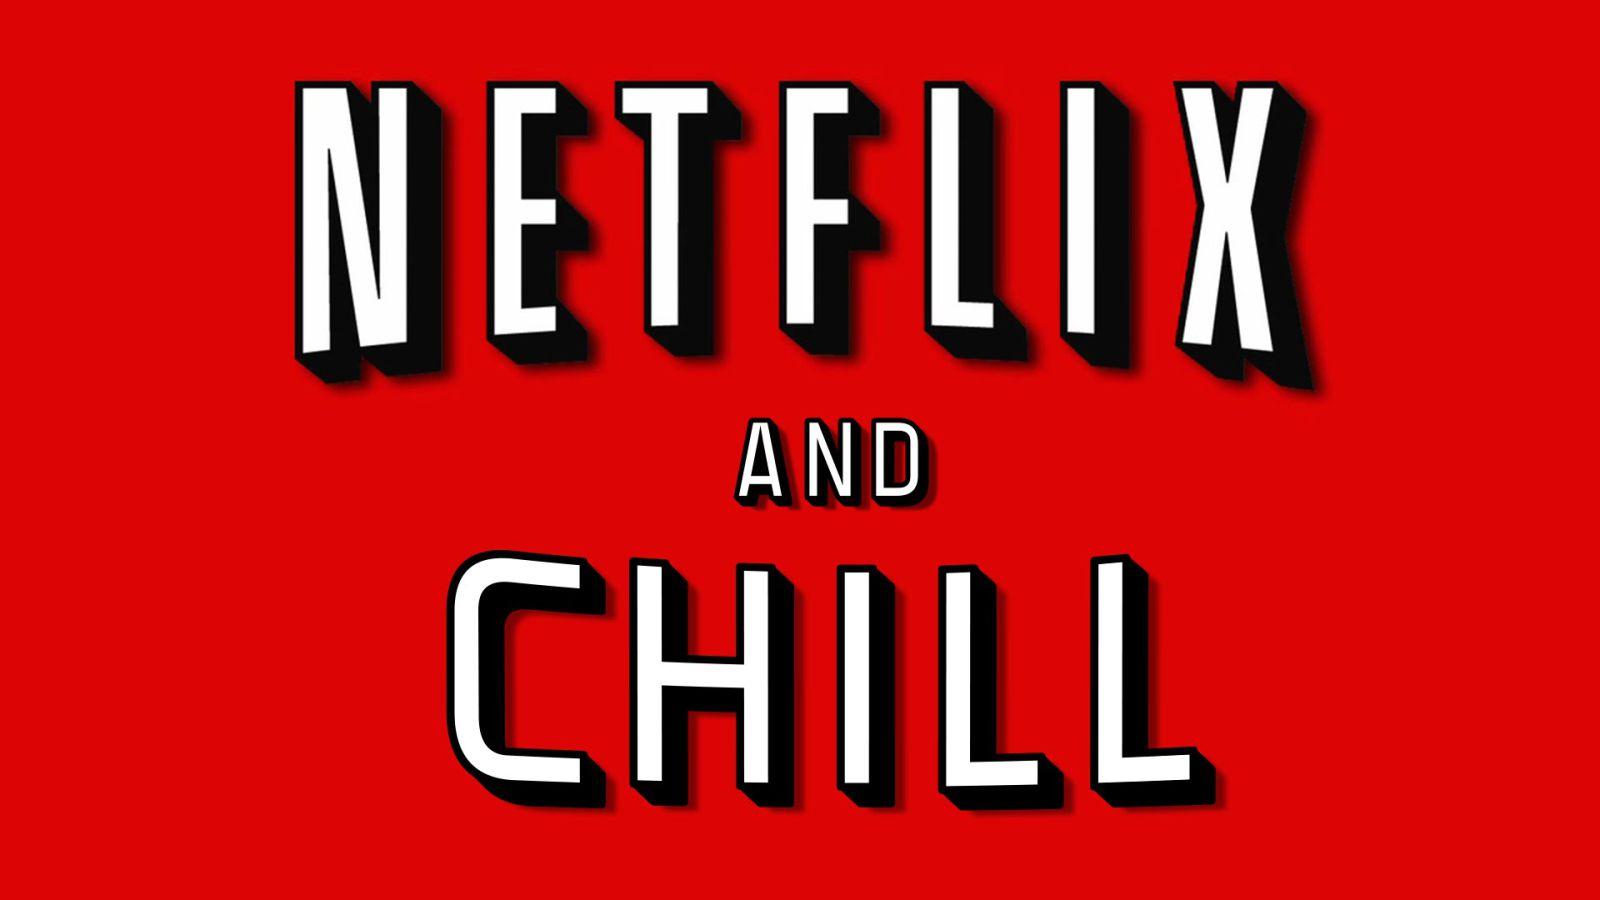 Netflixandchill 1